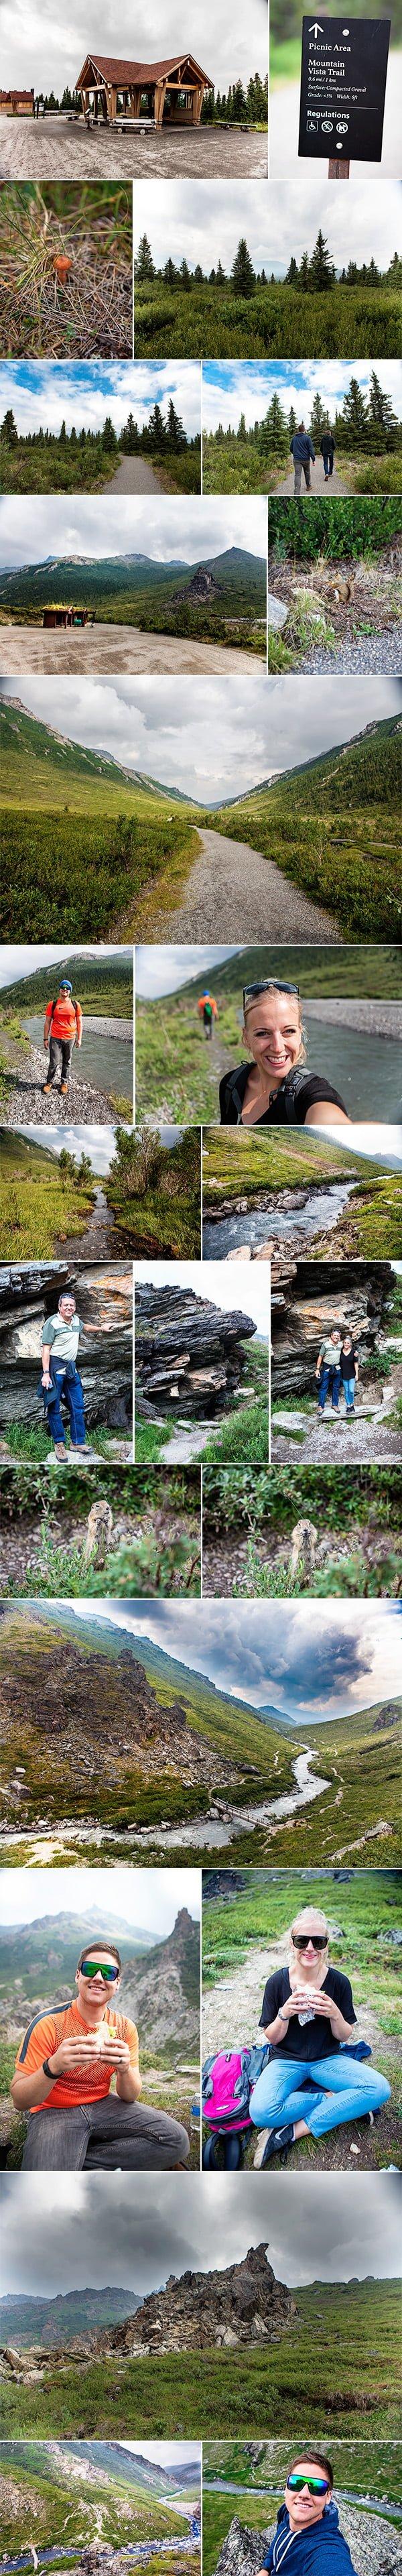 Denali National Park 01